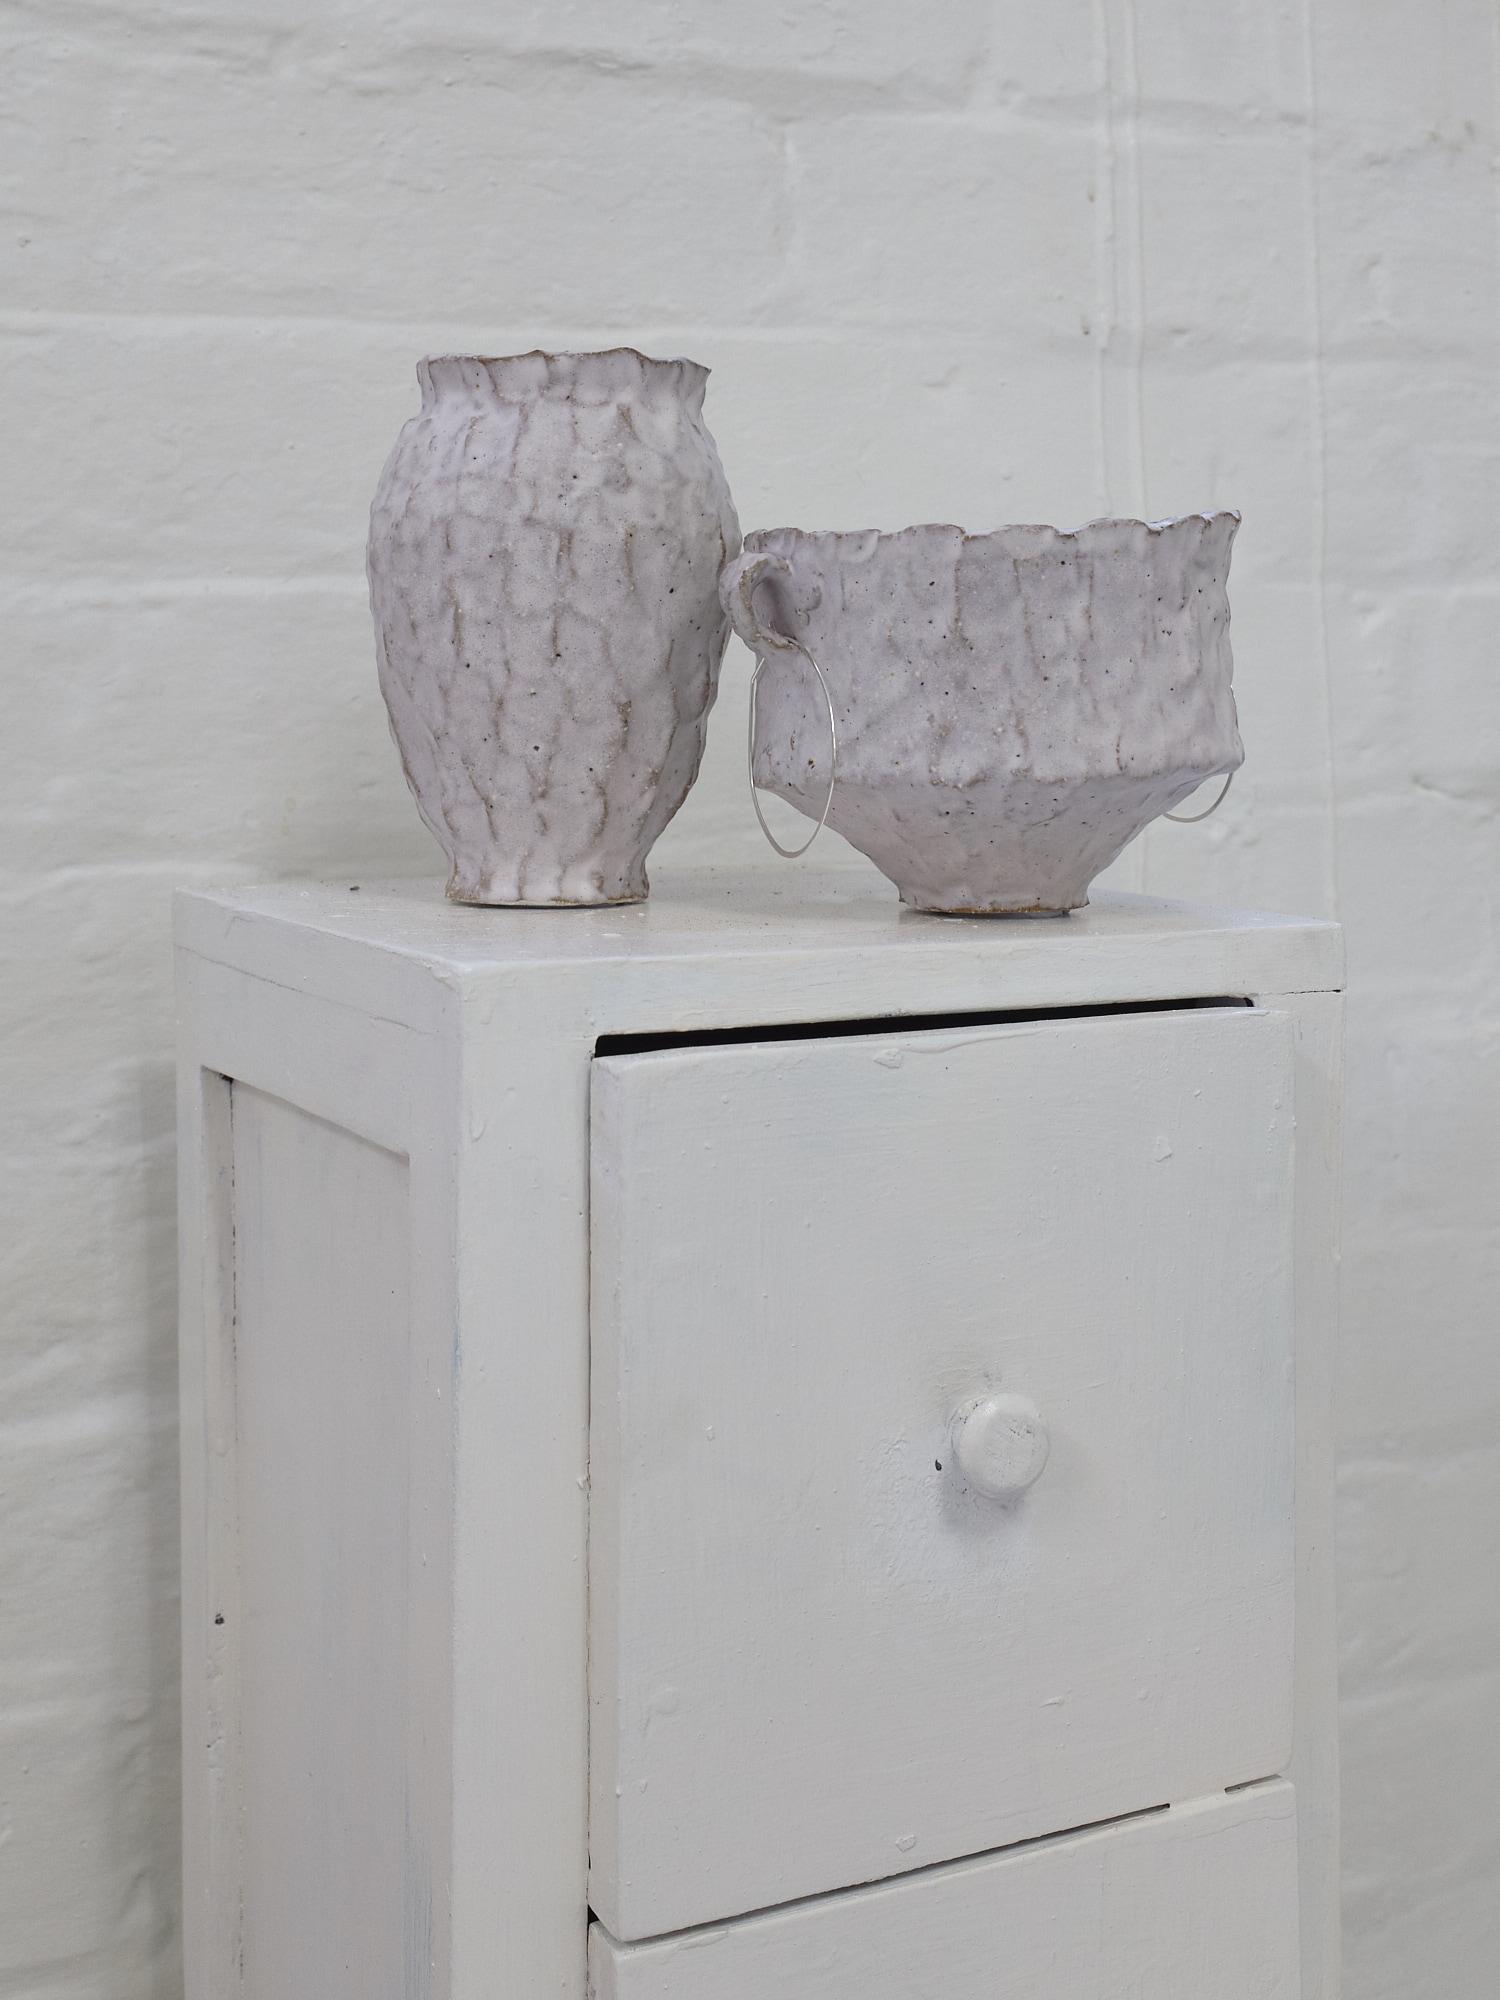 Connie Augoustinos,  Handled vessel  and  Vessel  2019. Stoneware, matte glaze.